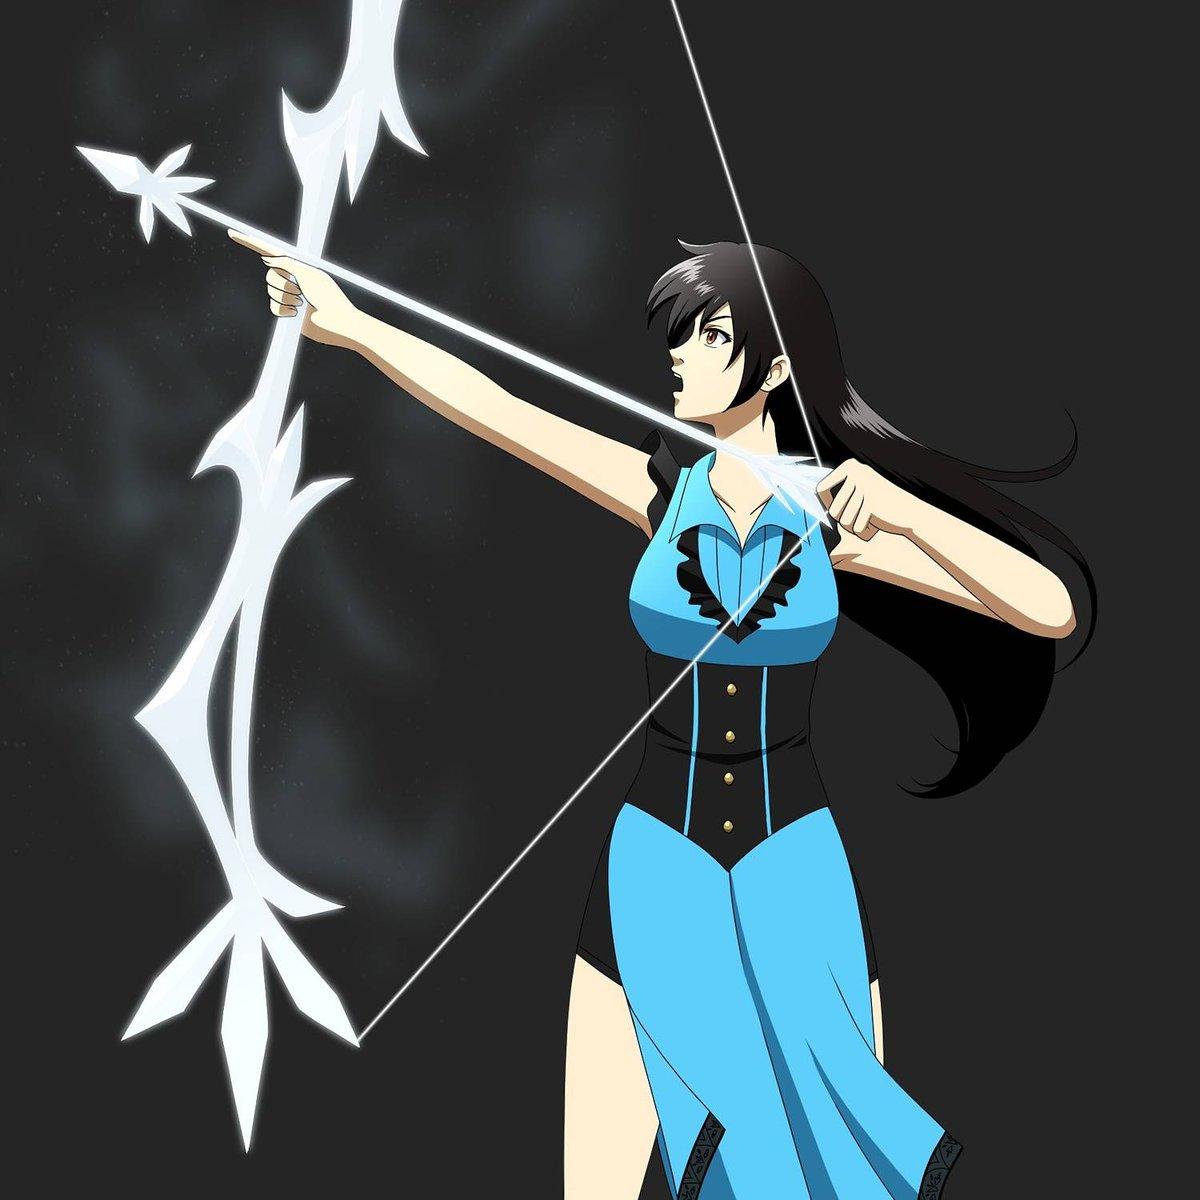 Happy birthday to the ice princess, Kagome Utari!! Make sure to follow her journey in Ranshio, in stores now! #lightnovel #anime #manga #otaku #ranshio #animegirl #swordartonline #art #fanart #naruto #itsukashido #tobiichiorigami #animeindo #japan #animelovers #sao